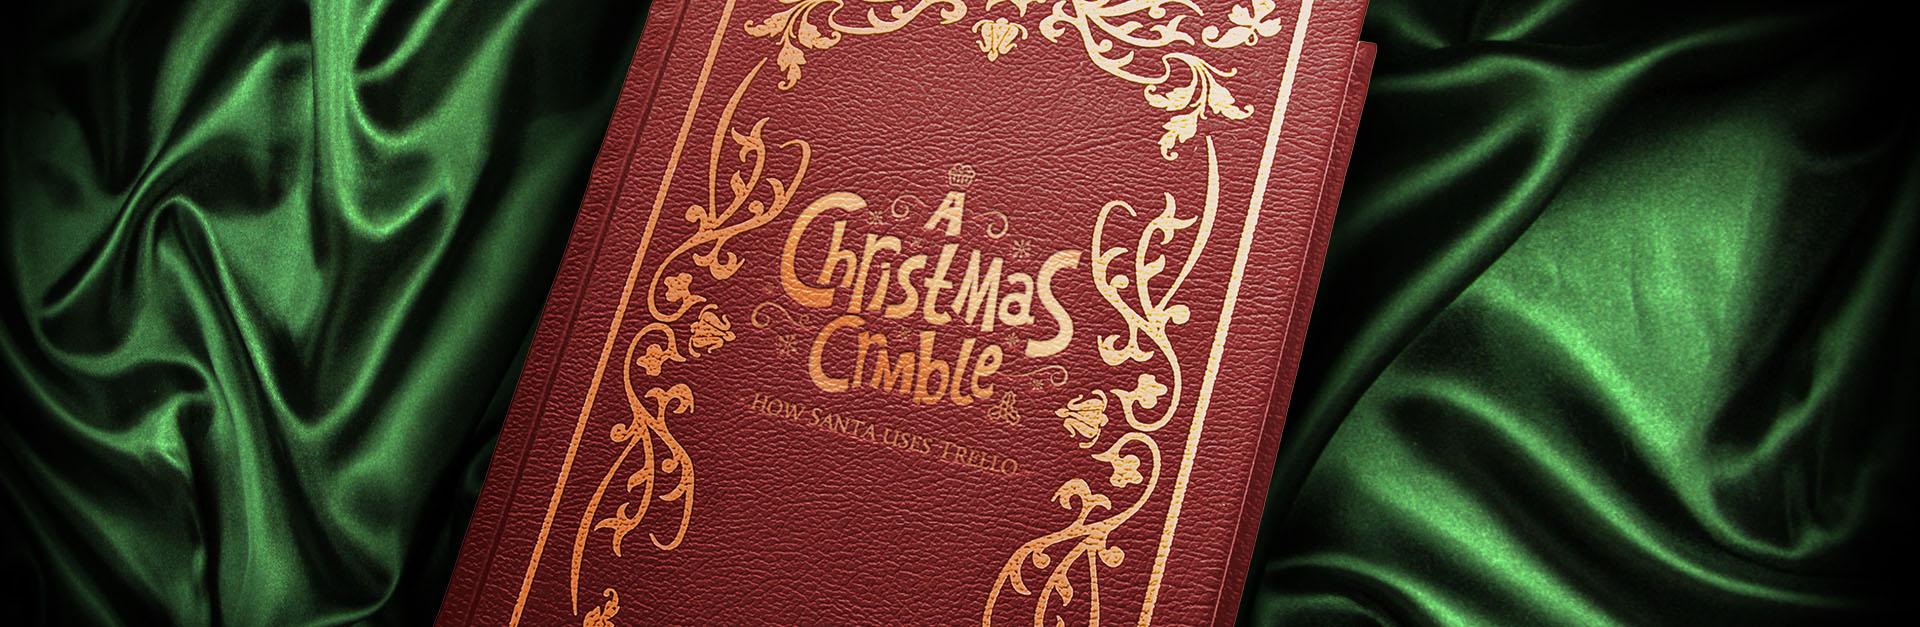 Crmble Christmas Event: How Santa uses Trello